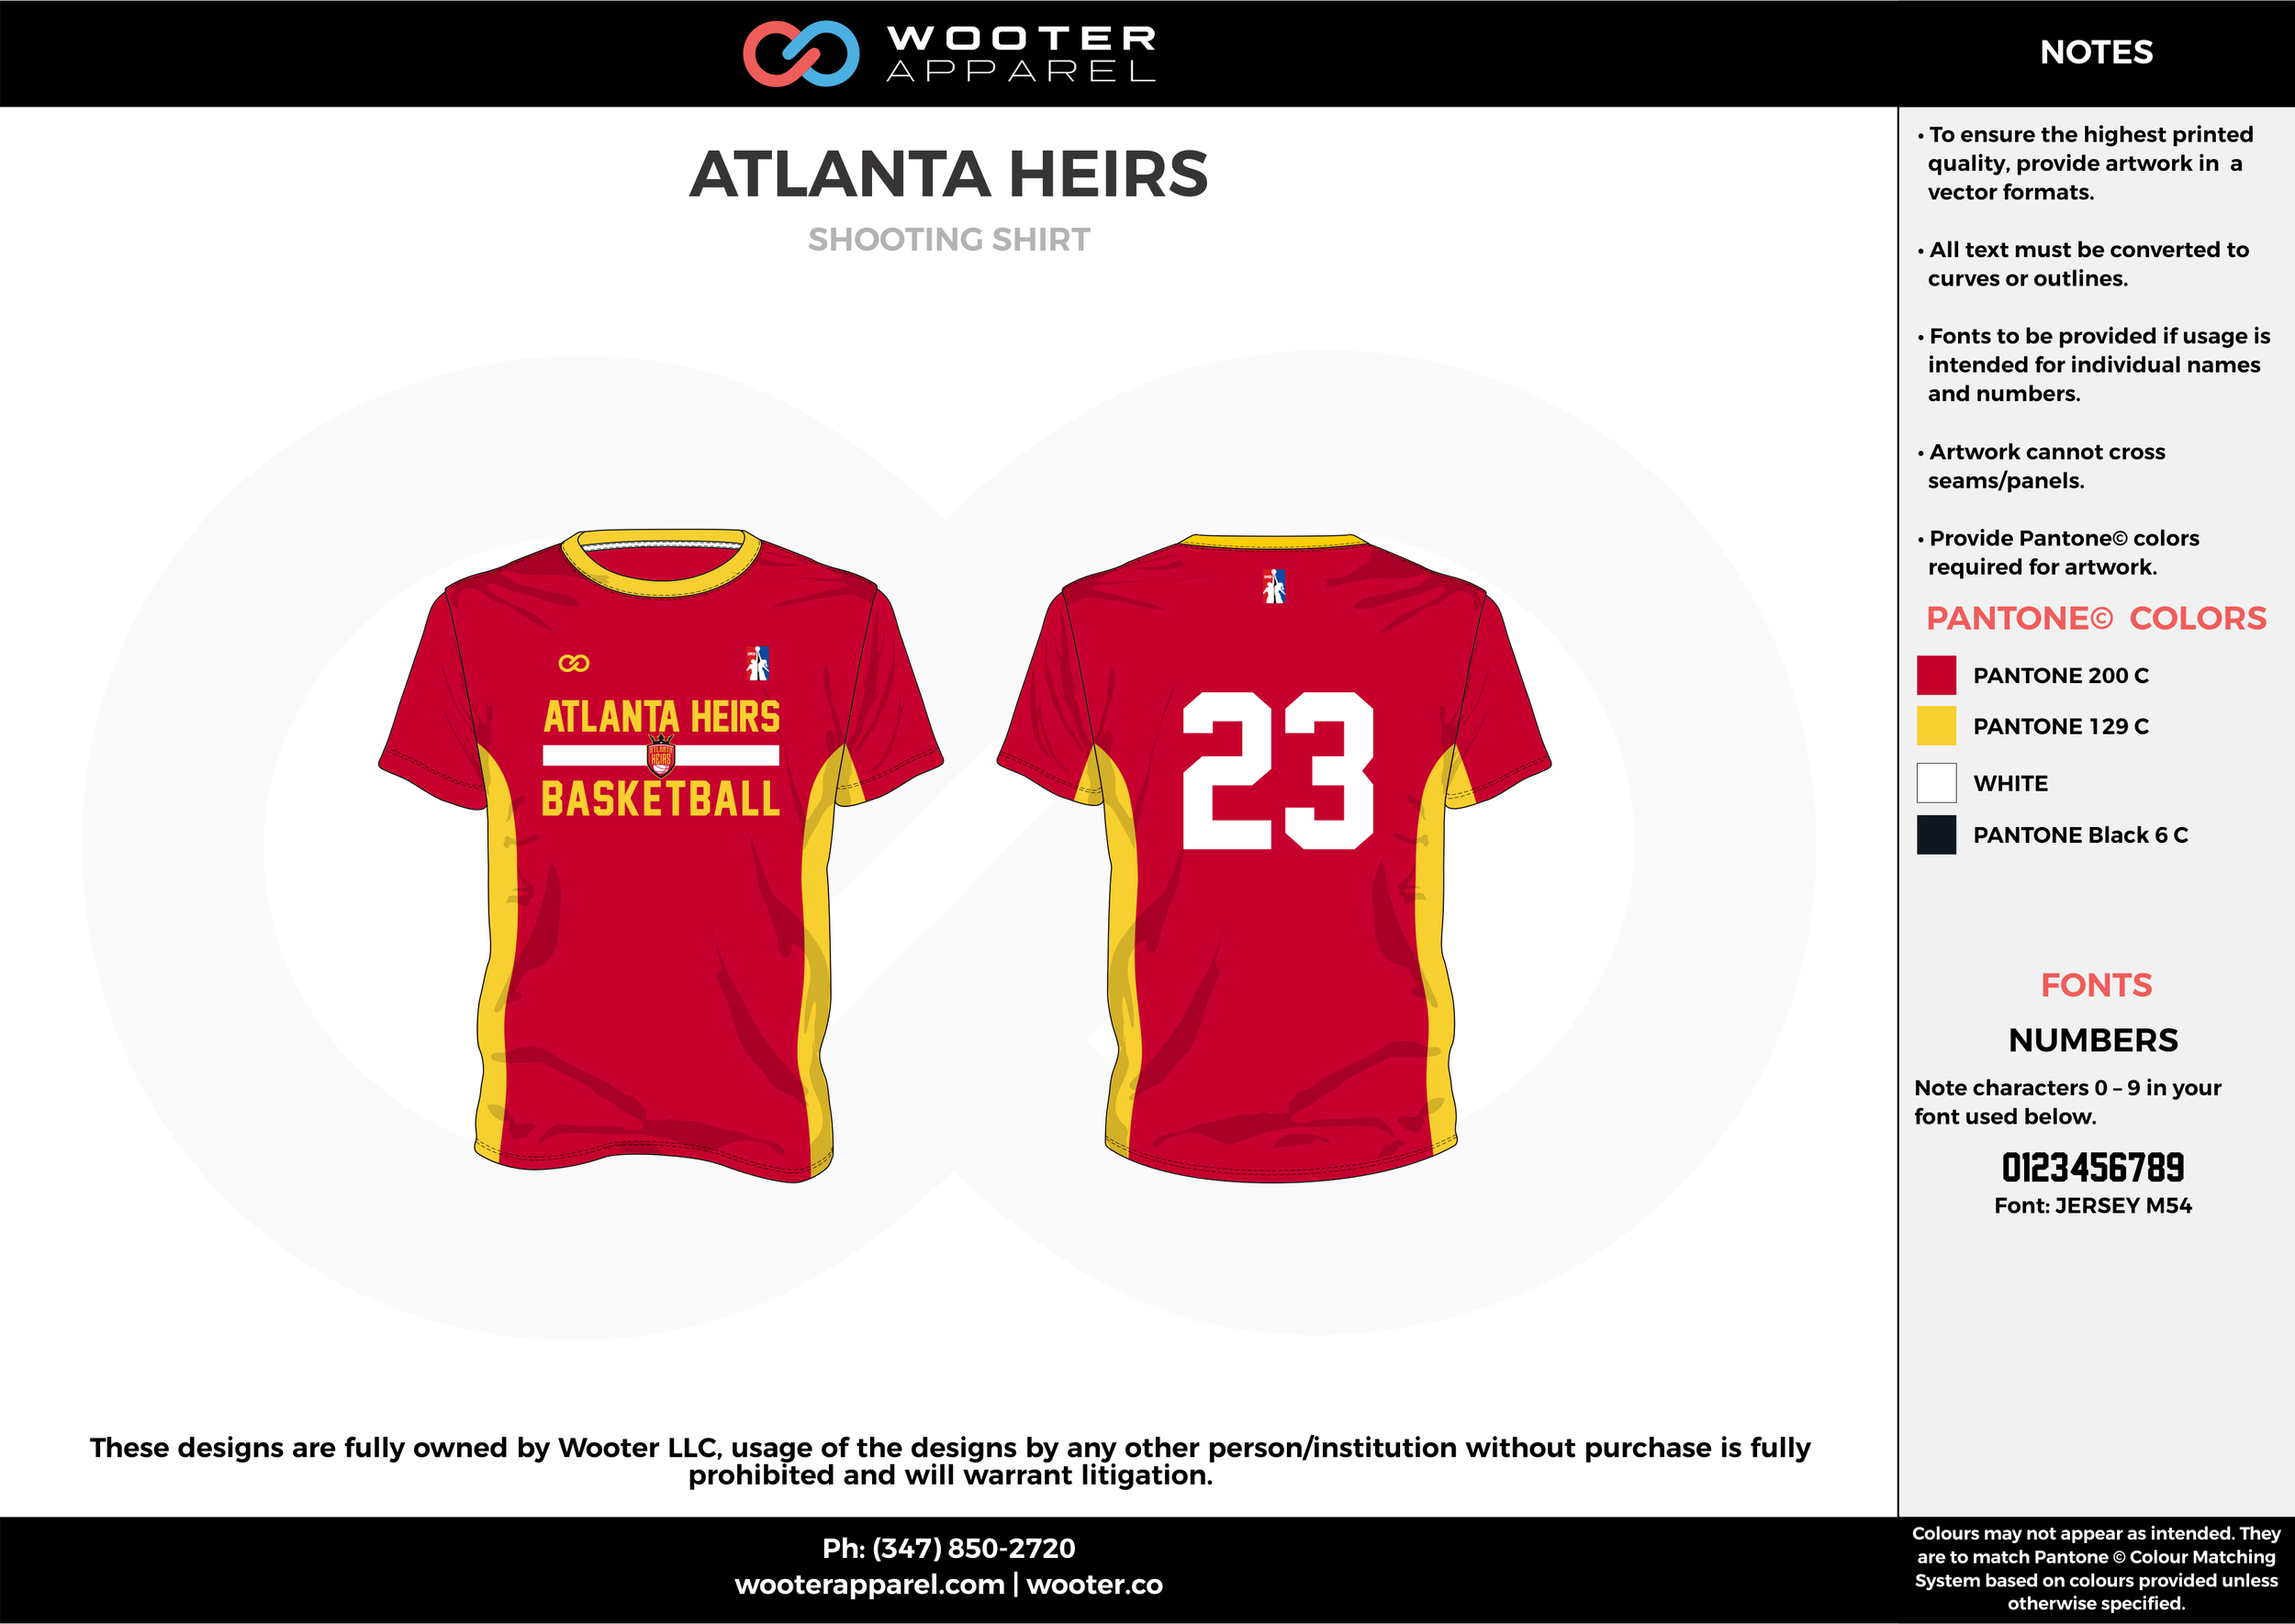 ATLANTA HEIRS red yellow white Basketball Short Sleeve Shooting Shirt